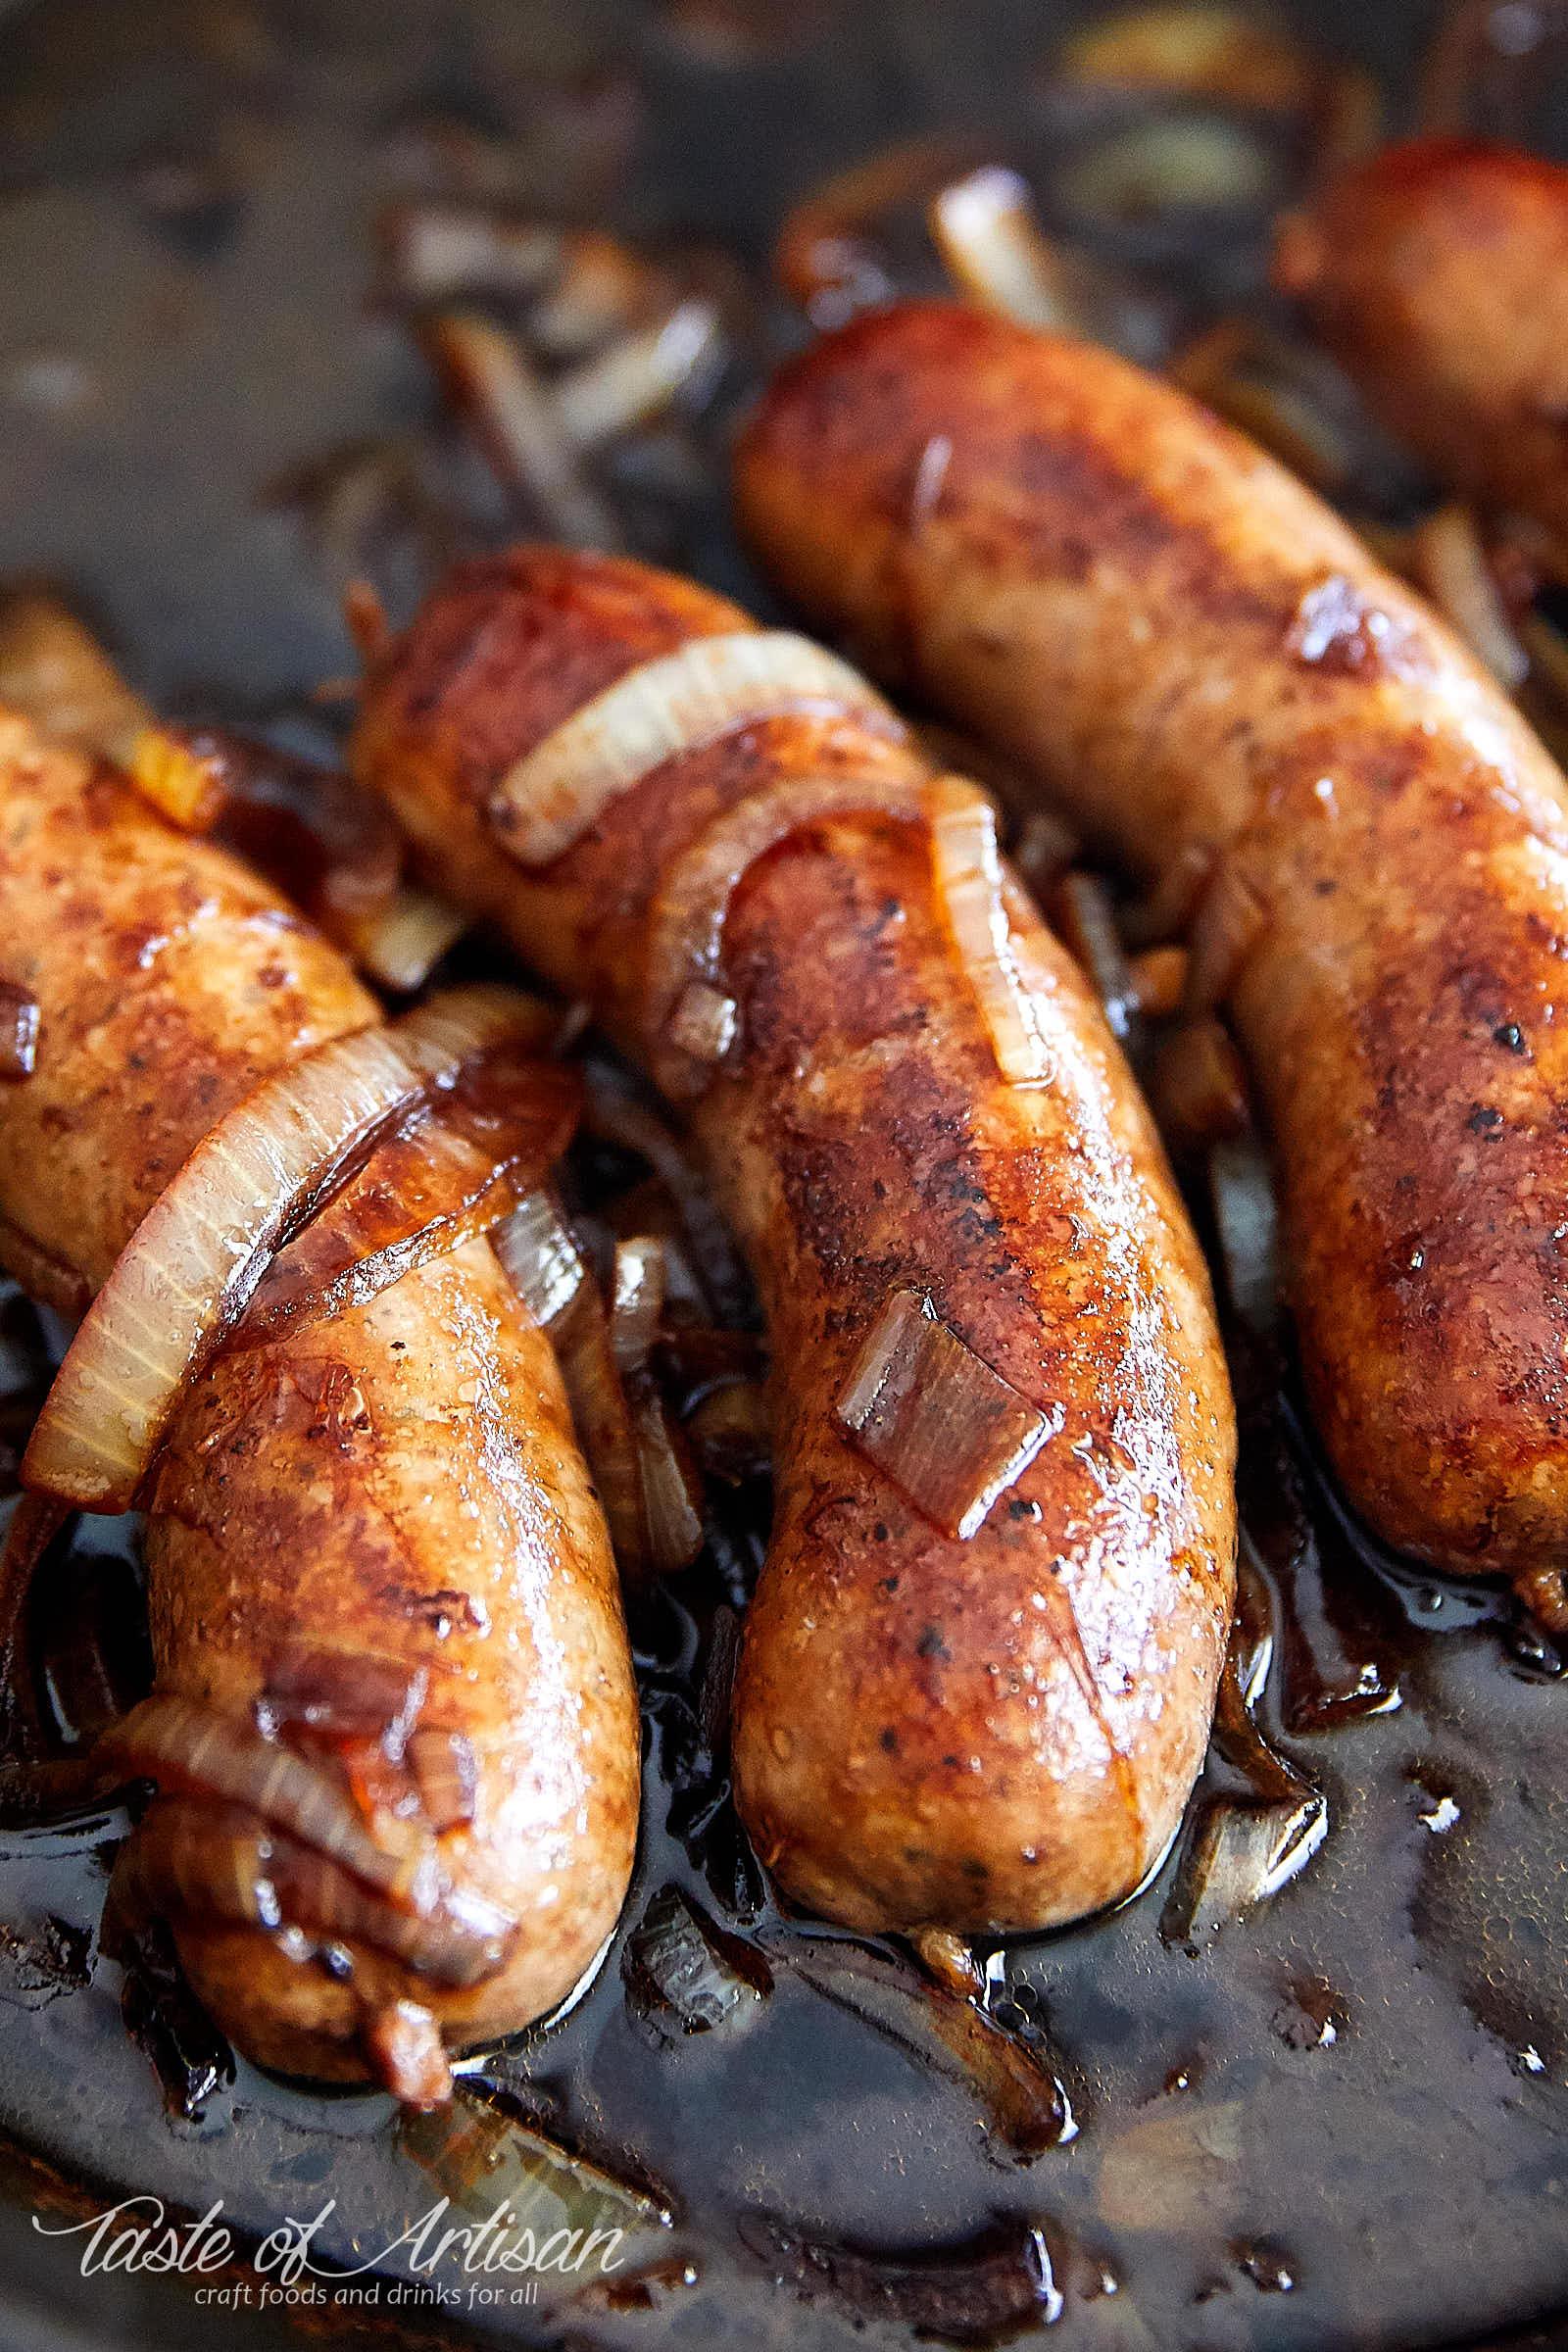 Homemade German Bratwurst Recipe | Taste of Artisan